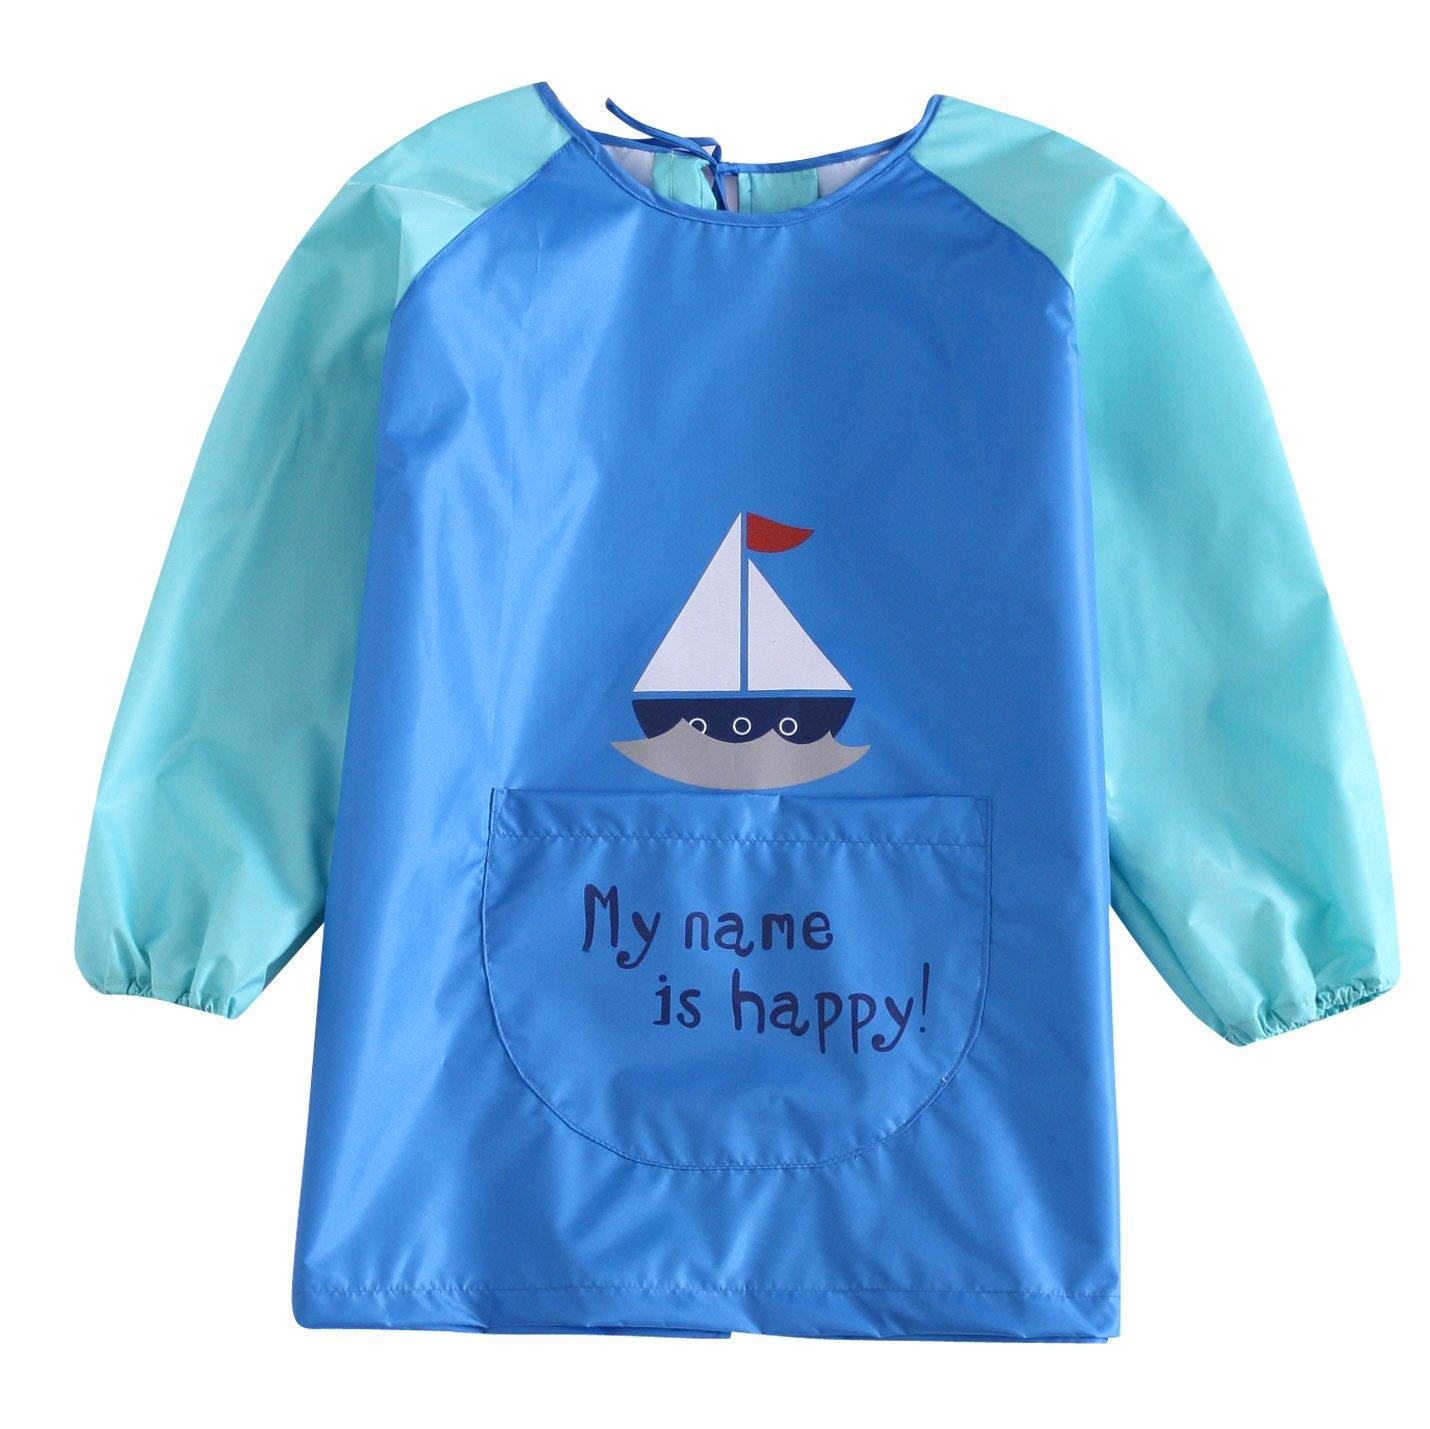 KIDS MAM DAD Unisex Baby Long Sleeves Apron Waterproof Cartoon Animal Pattern Art Craft Bib Smock Light Blue Age 2 to 4 Years